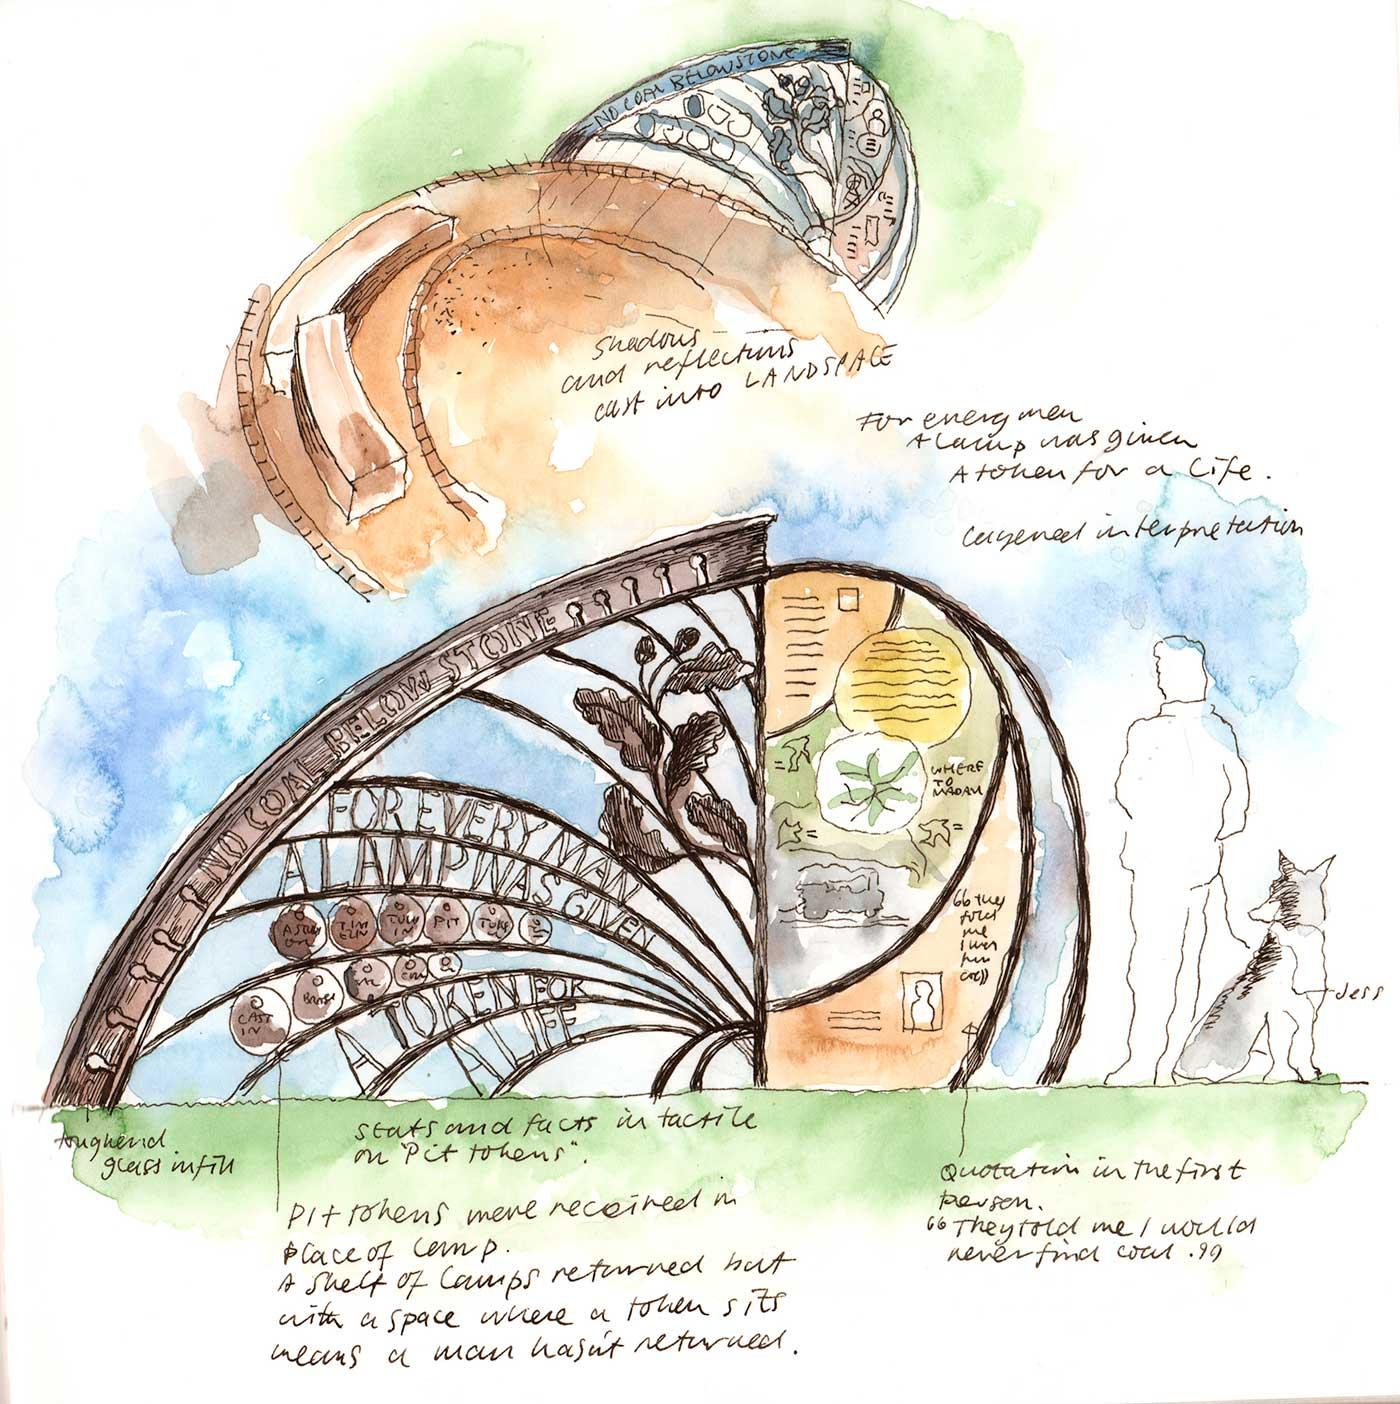 Original sketch for the concept of the interpretive hubs.